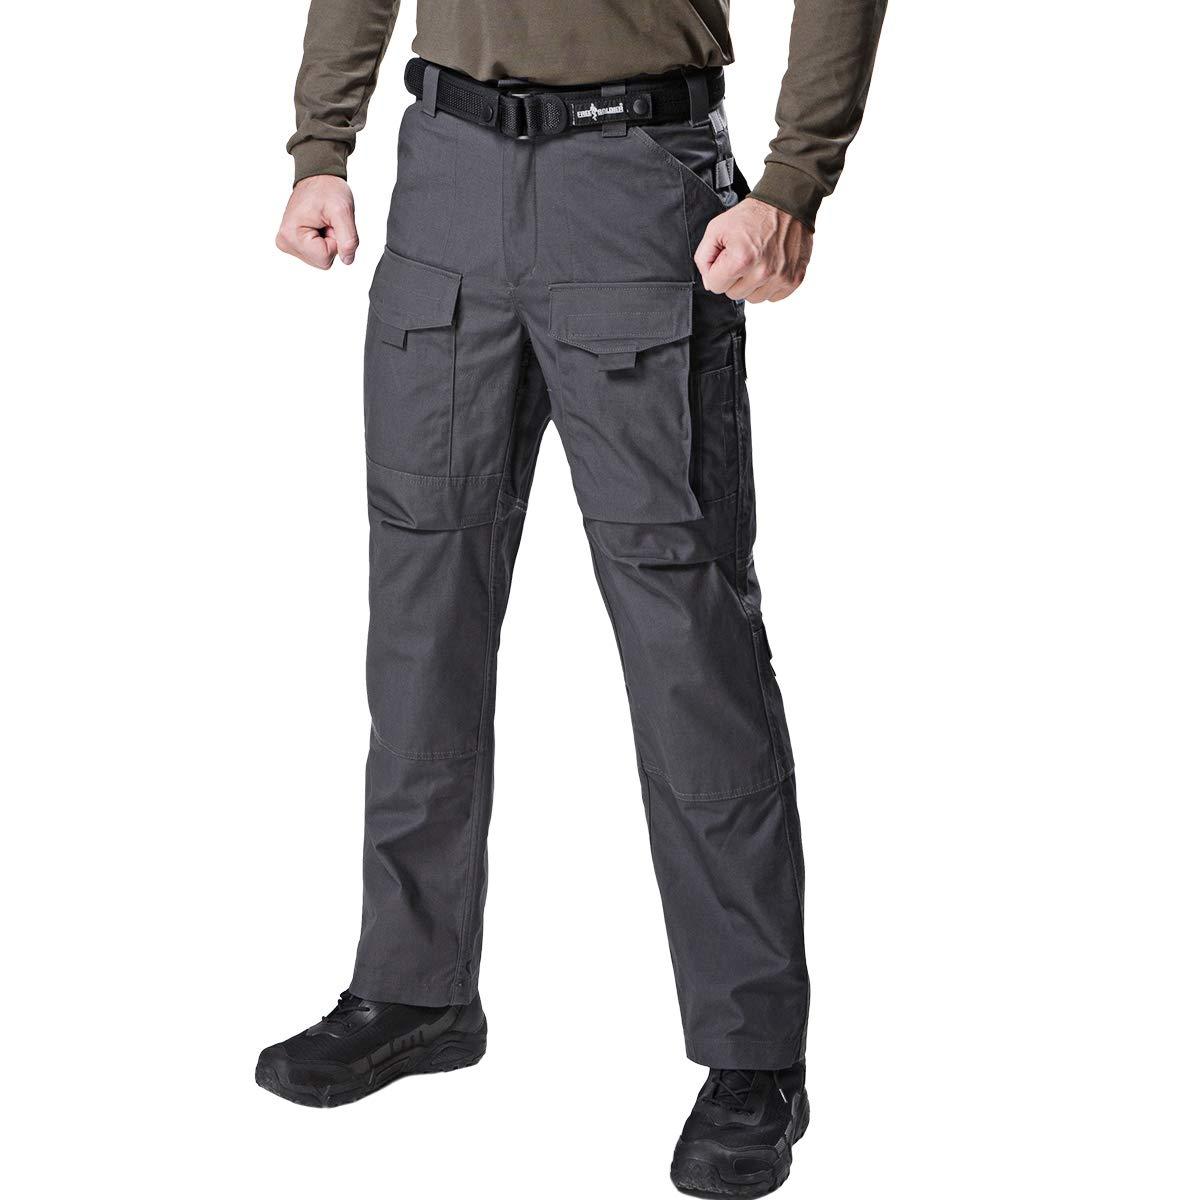 fd01656c3e67 Amazon.com   FREE SOLDIER Outdoor Men Teflon Scratch-Resistant Pants Four  Seasons Hiking Climbing Tactical Trousers   Clothing